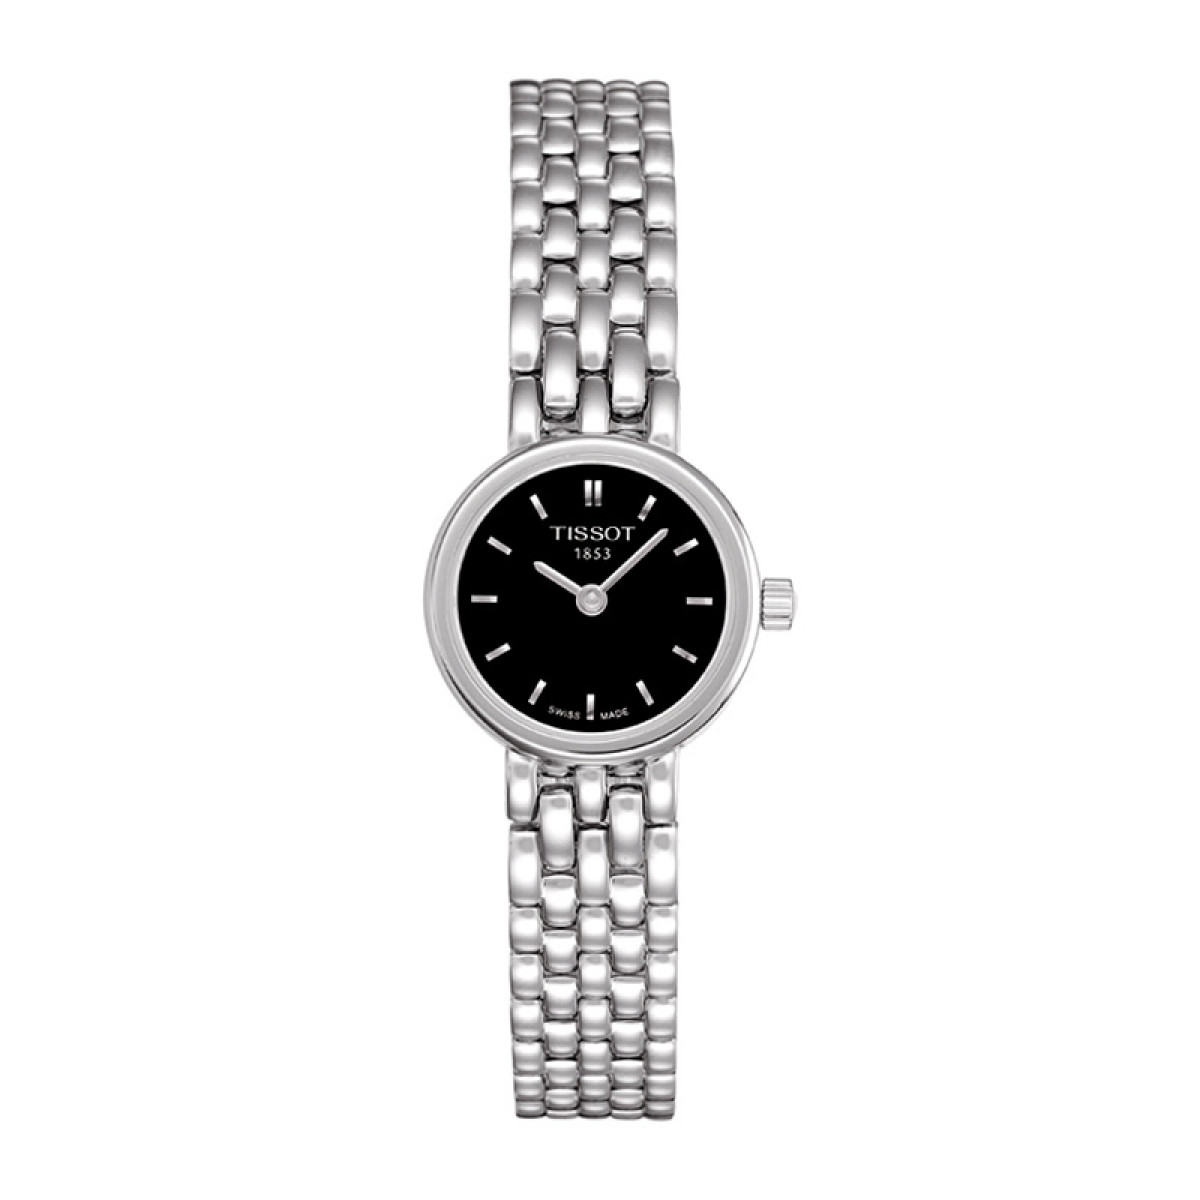 Часовник Tissot T058.009.11.051.00